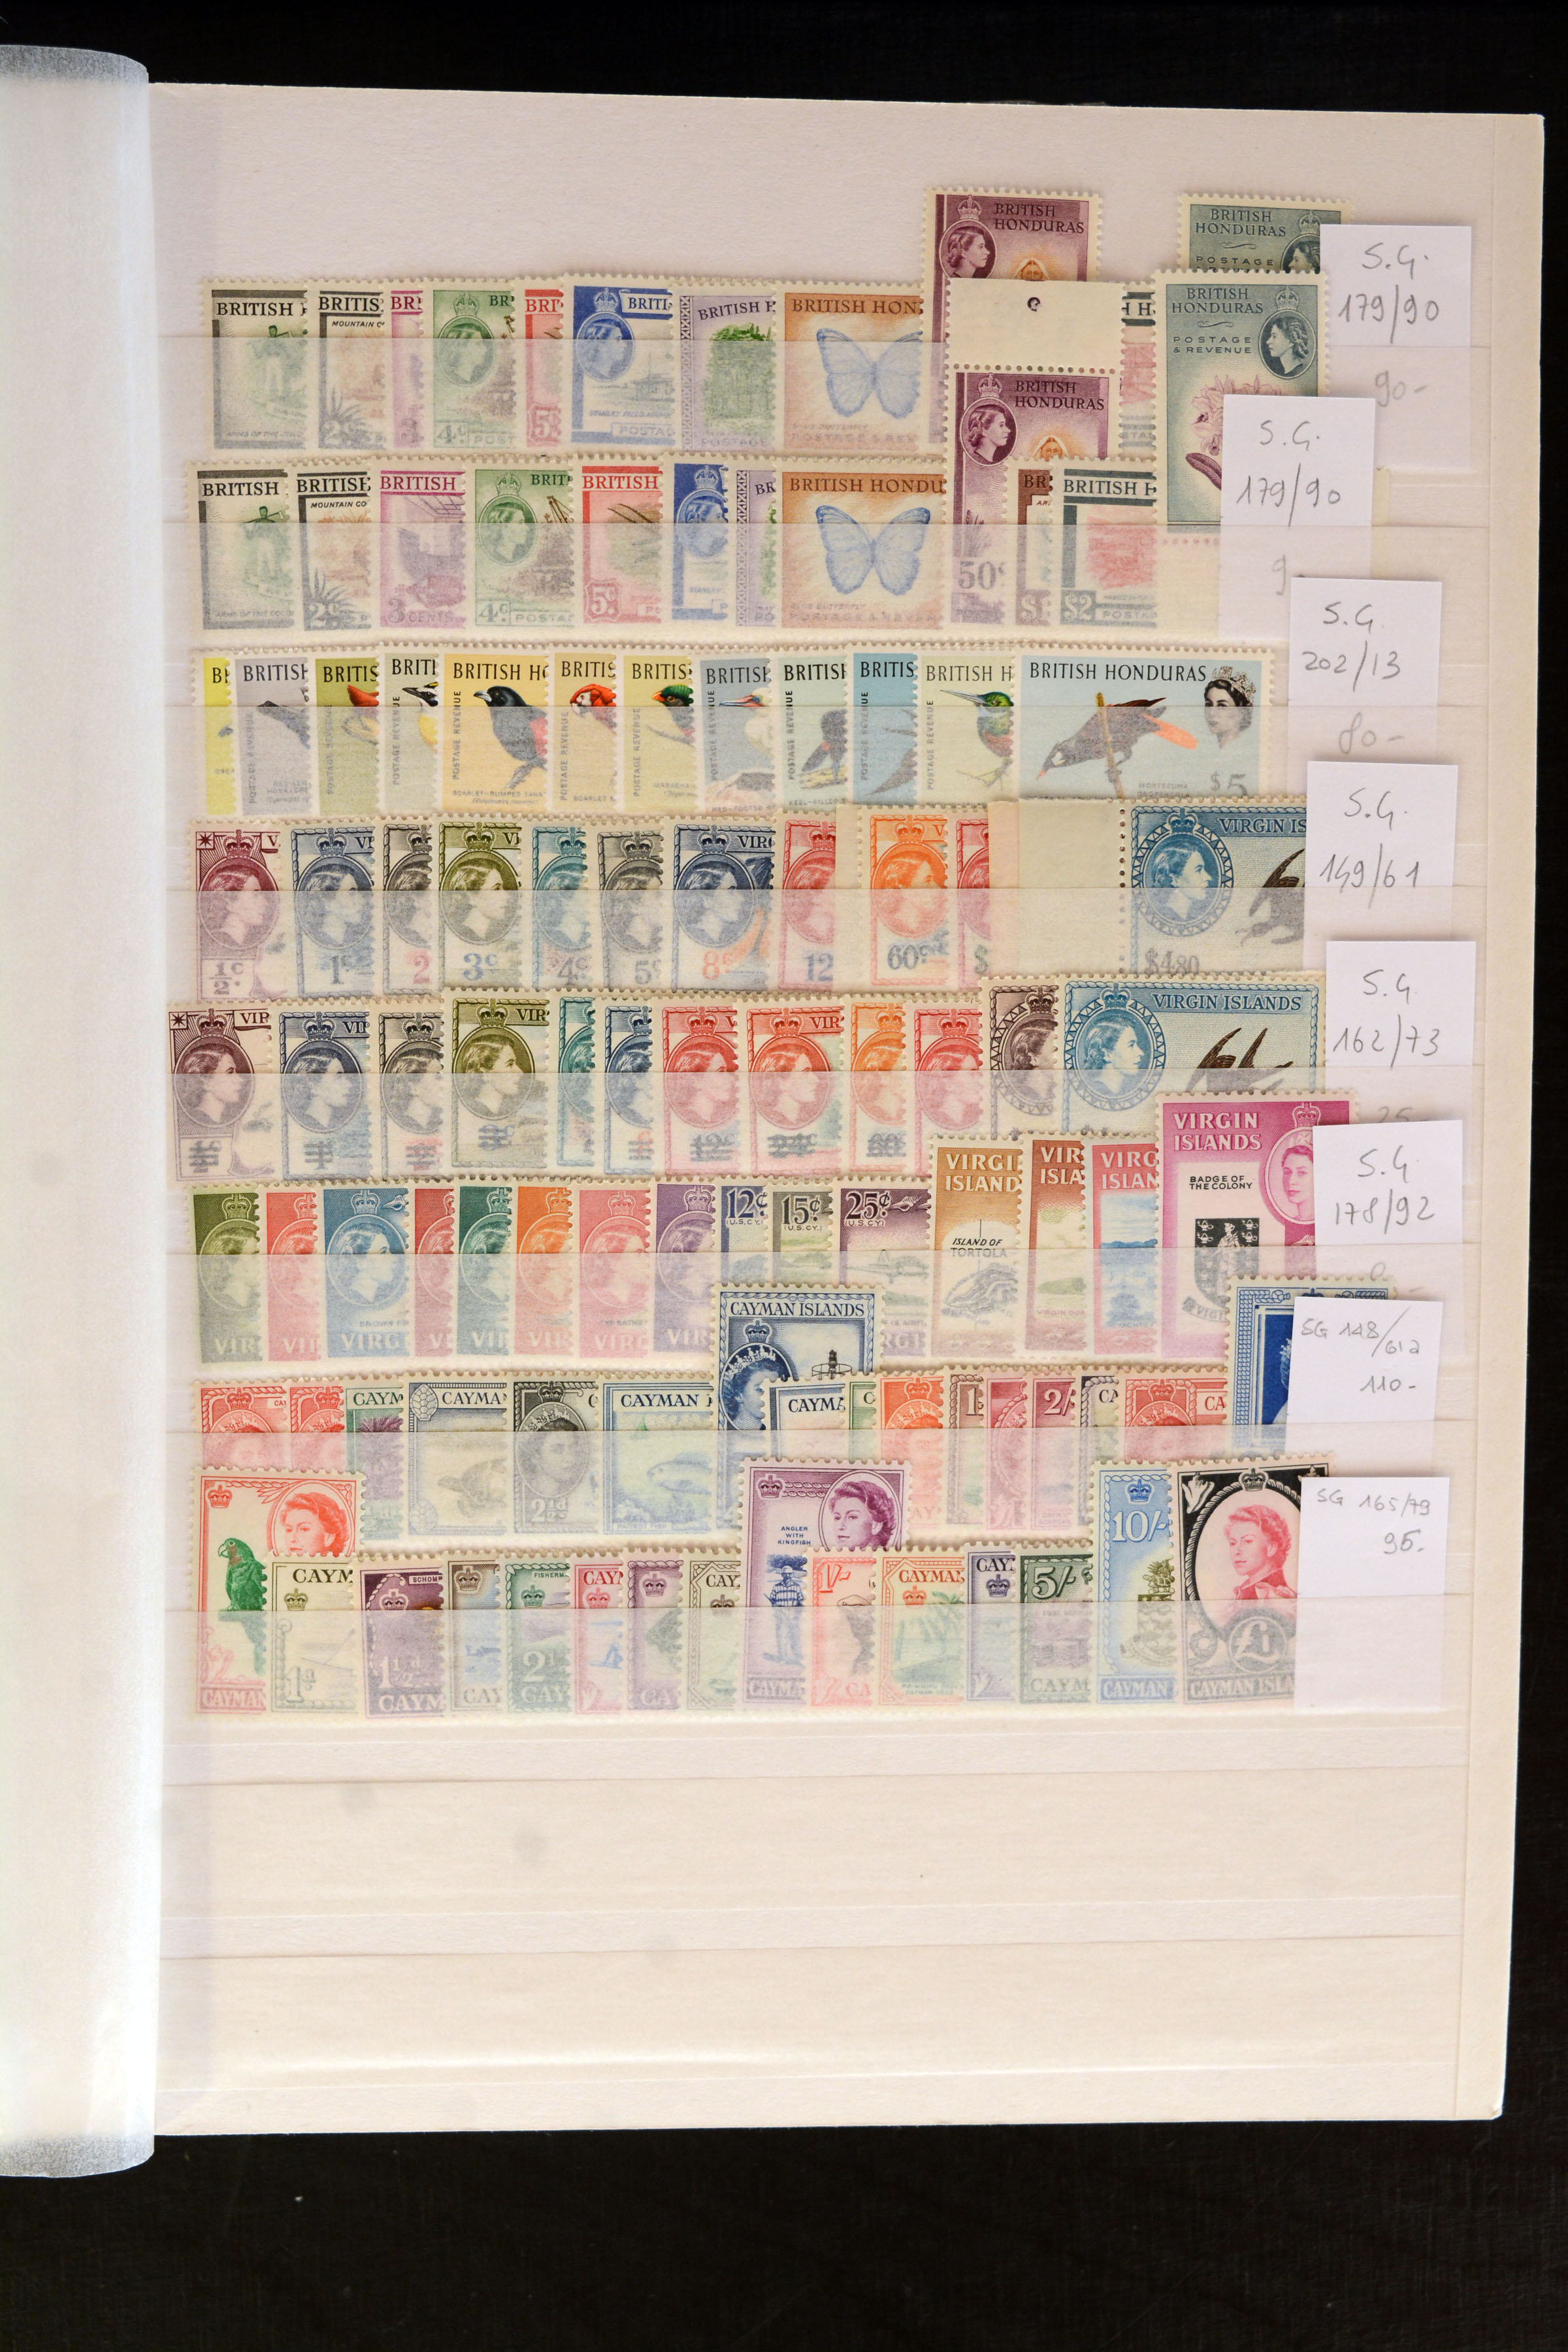 Lot 4149 - British Commonwealth british colonies and offices abroad -  Heinrich Koehler Auktionen Auction #368- Day 3